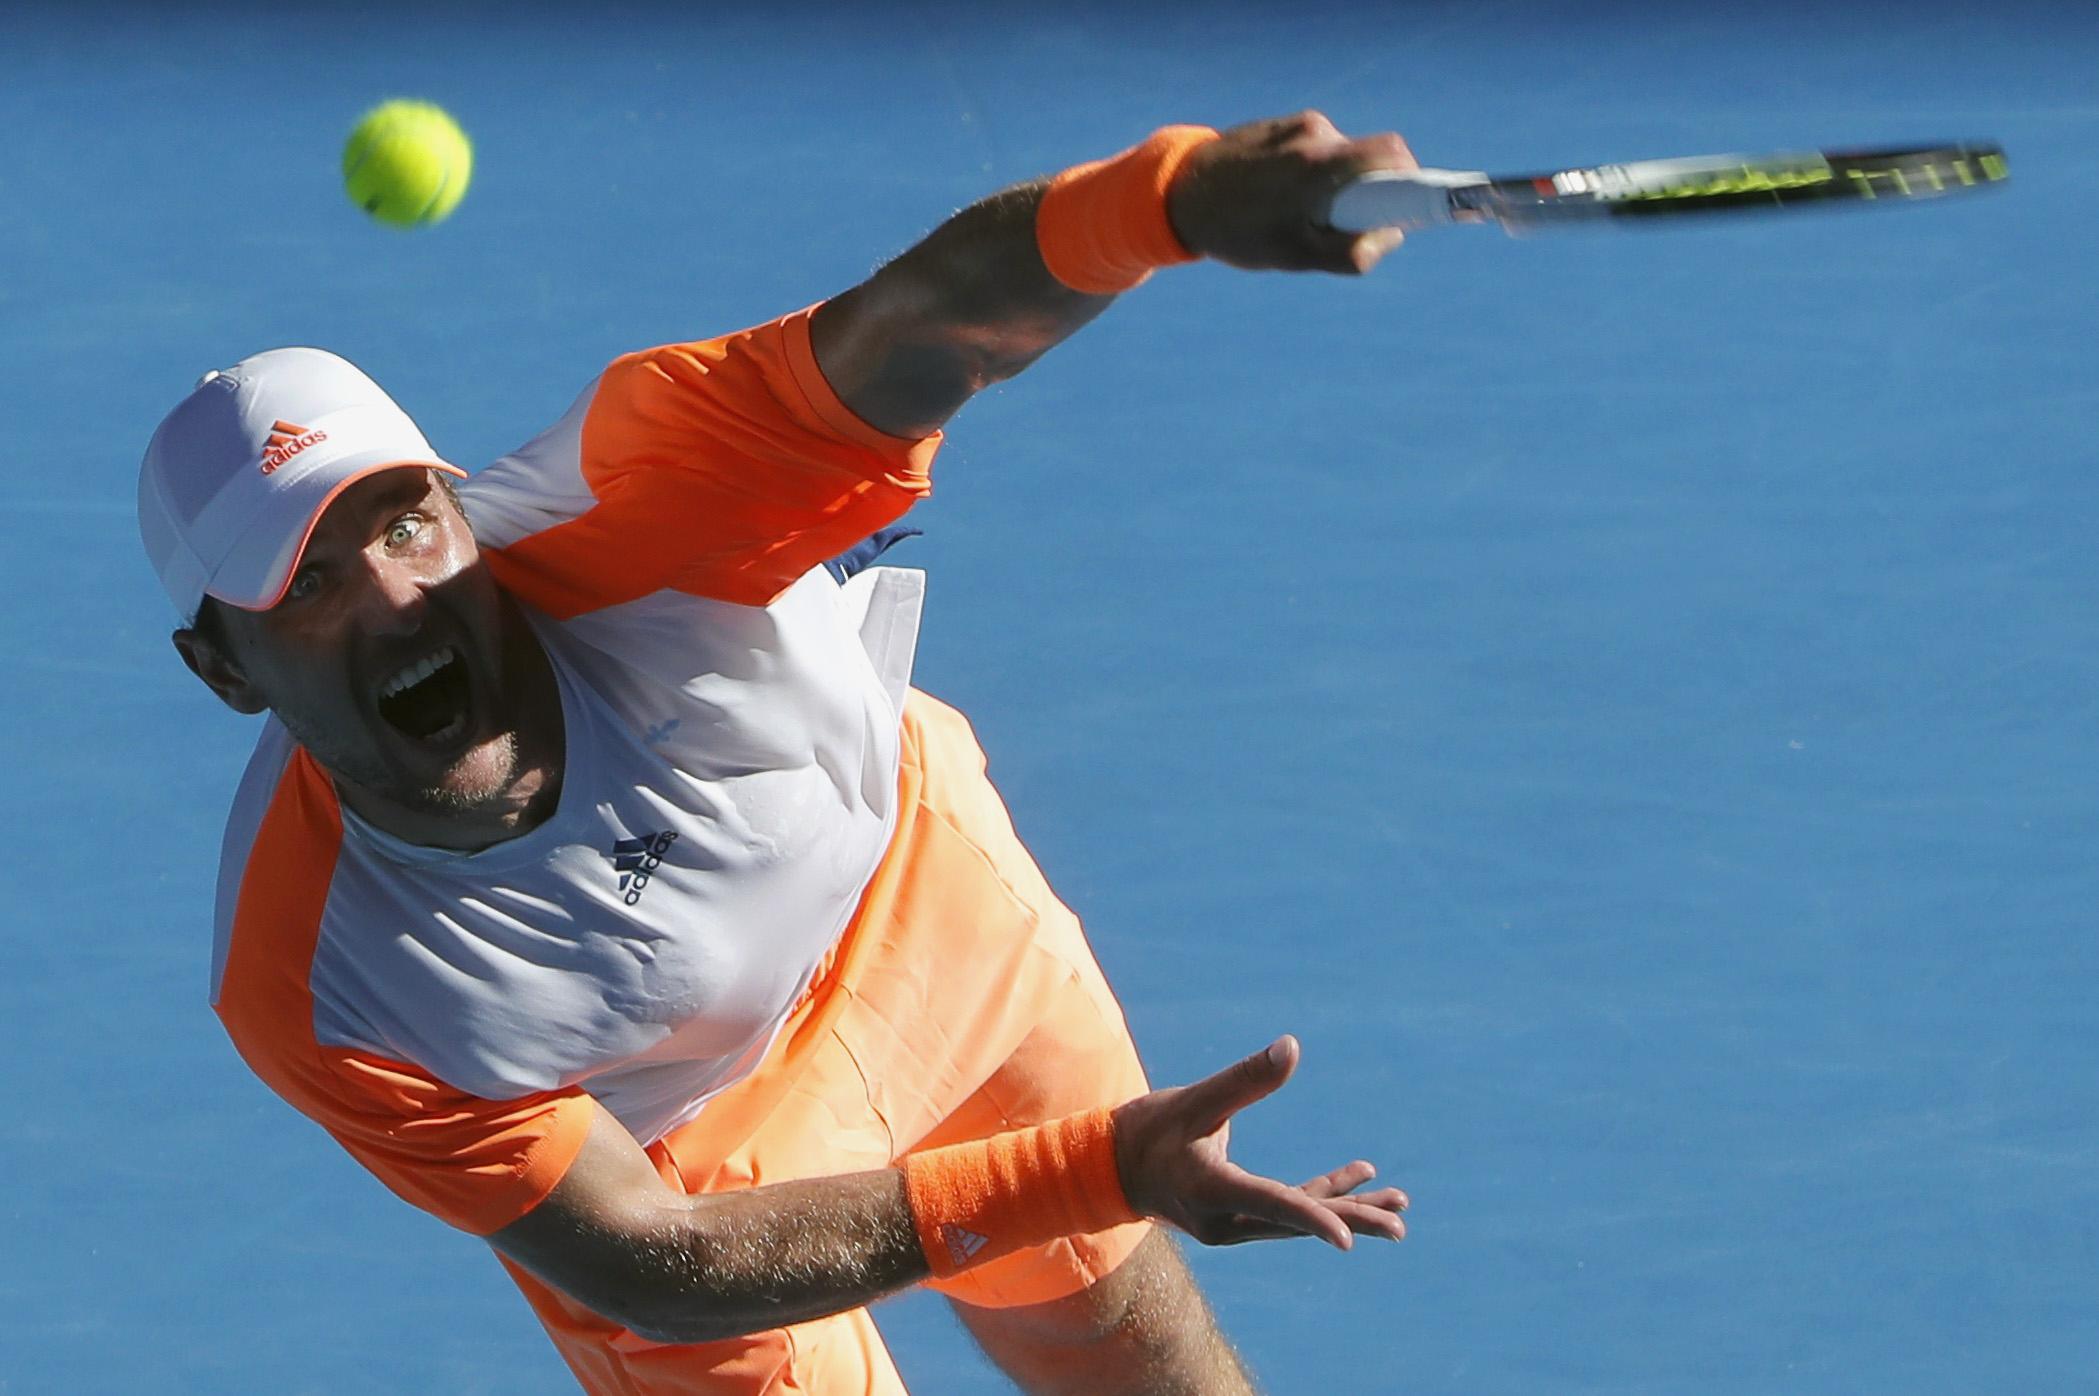 Tennis - Open Australie - Federer, McEnroe, NBA : 5 choses à savoir sur Mischa Zverev